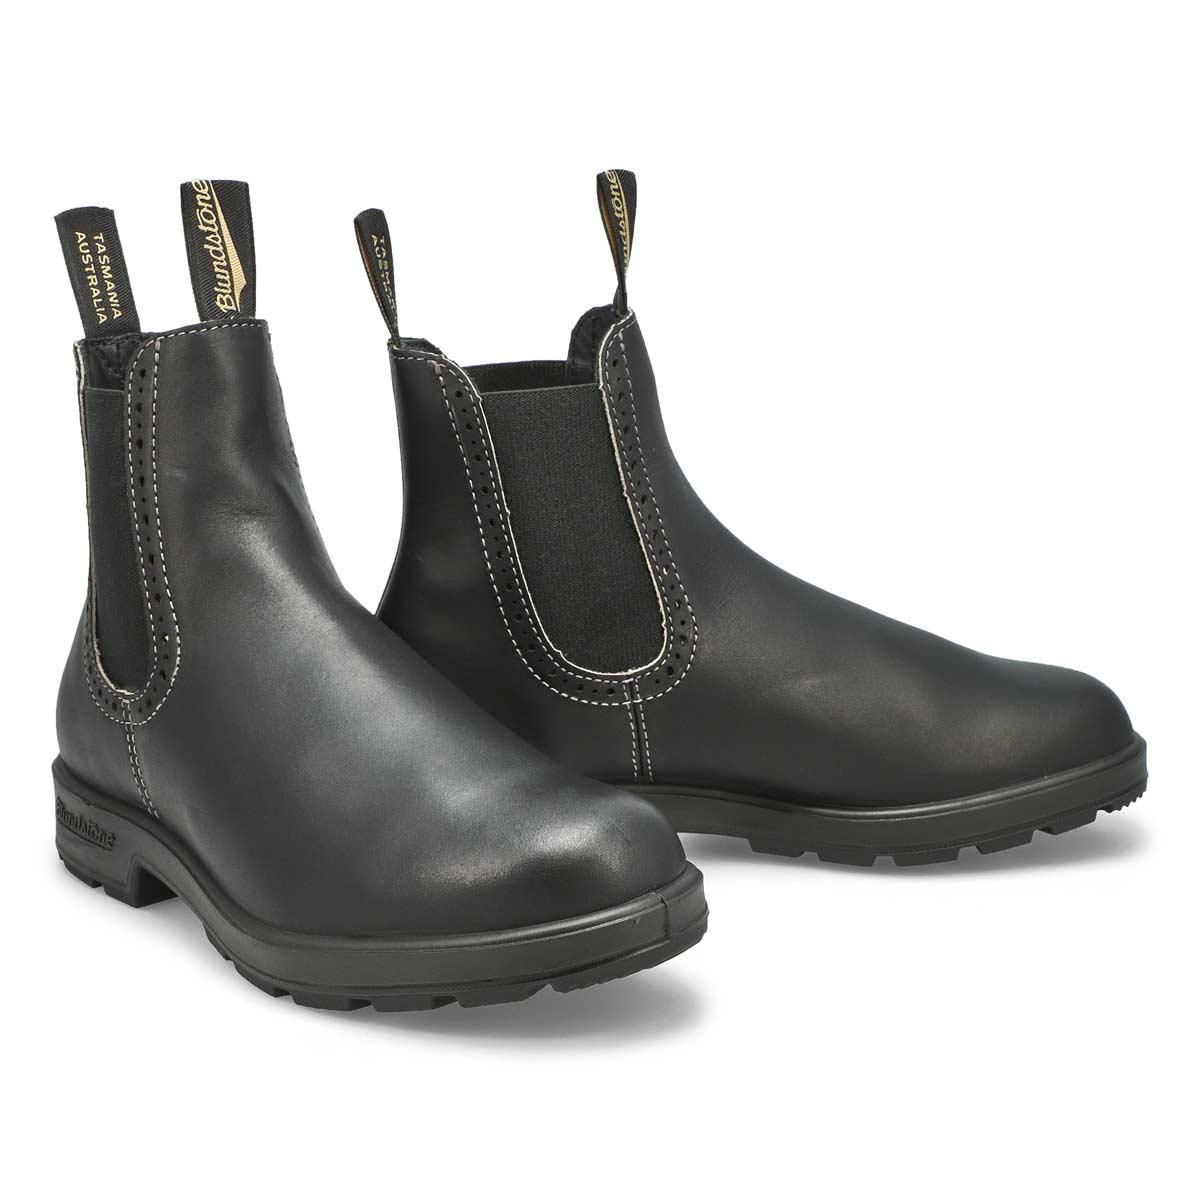 Lds Girlfriend black pull on boot